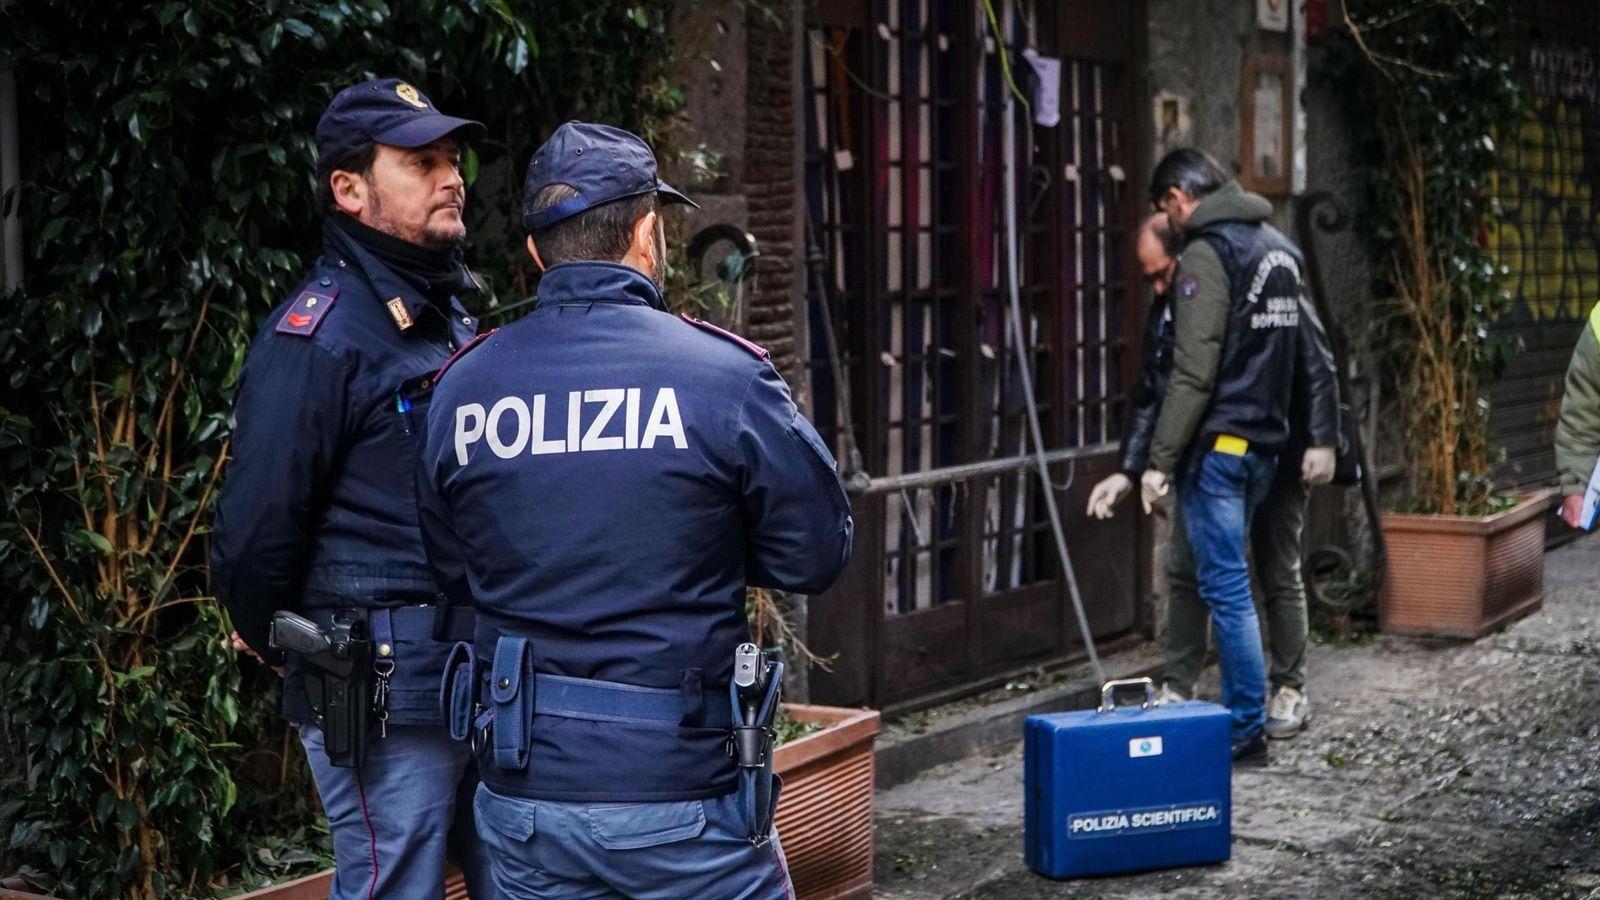 Vinculan un atropello mortal en Italia con un ataque de ultras de quinta división